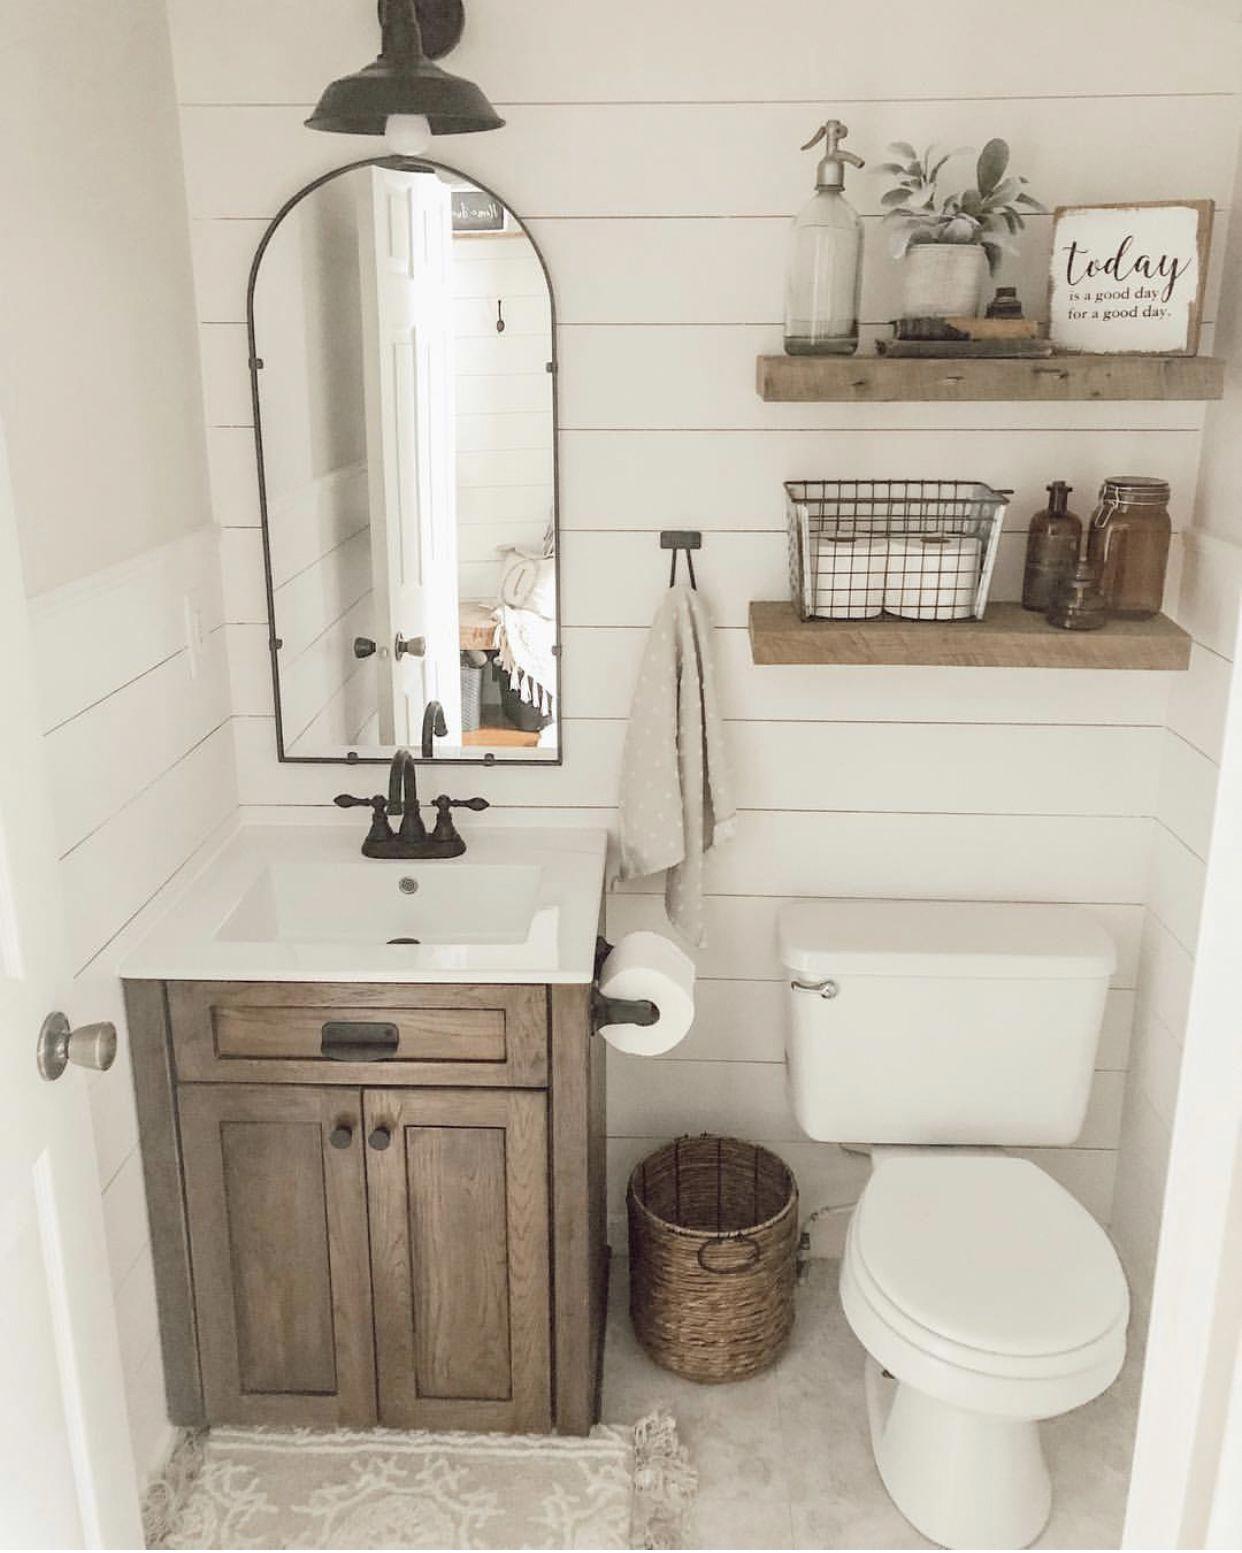 This Is Kinda Like My New Bathroom At My House So I Really Love The Decor And The Shelves Would Really Small Bathroom Remodel Bathrooms Remodel Bathroom Decor